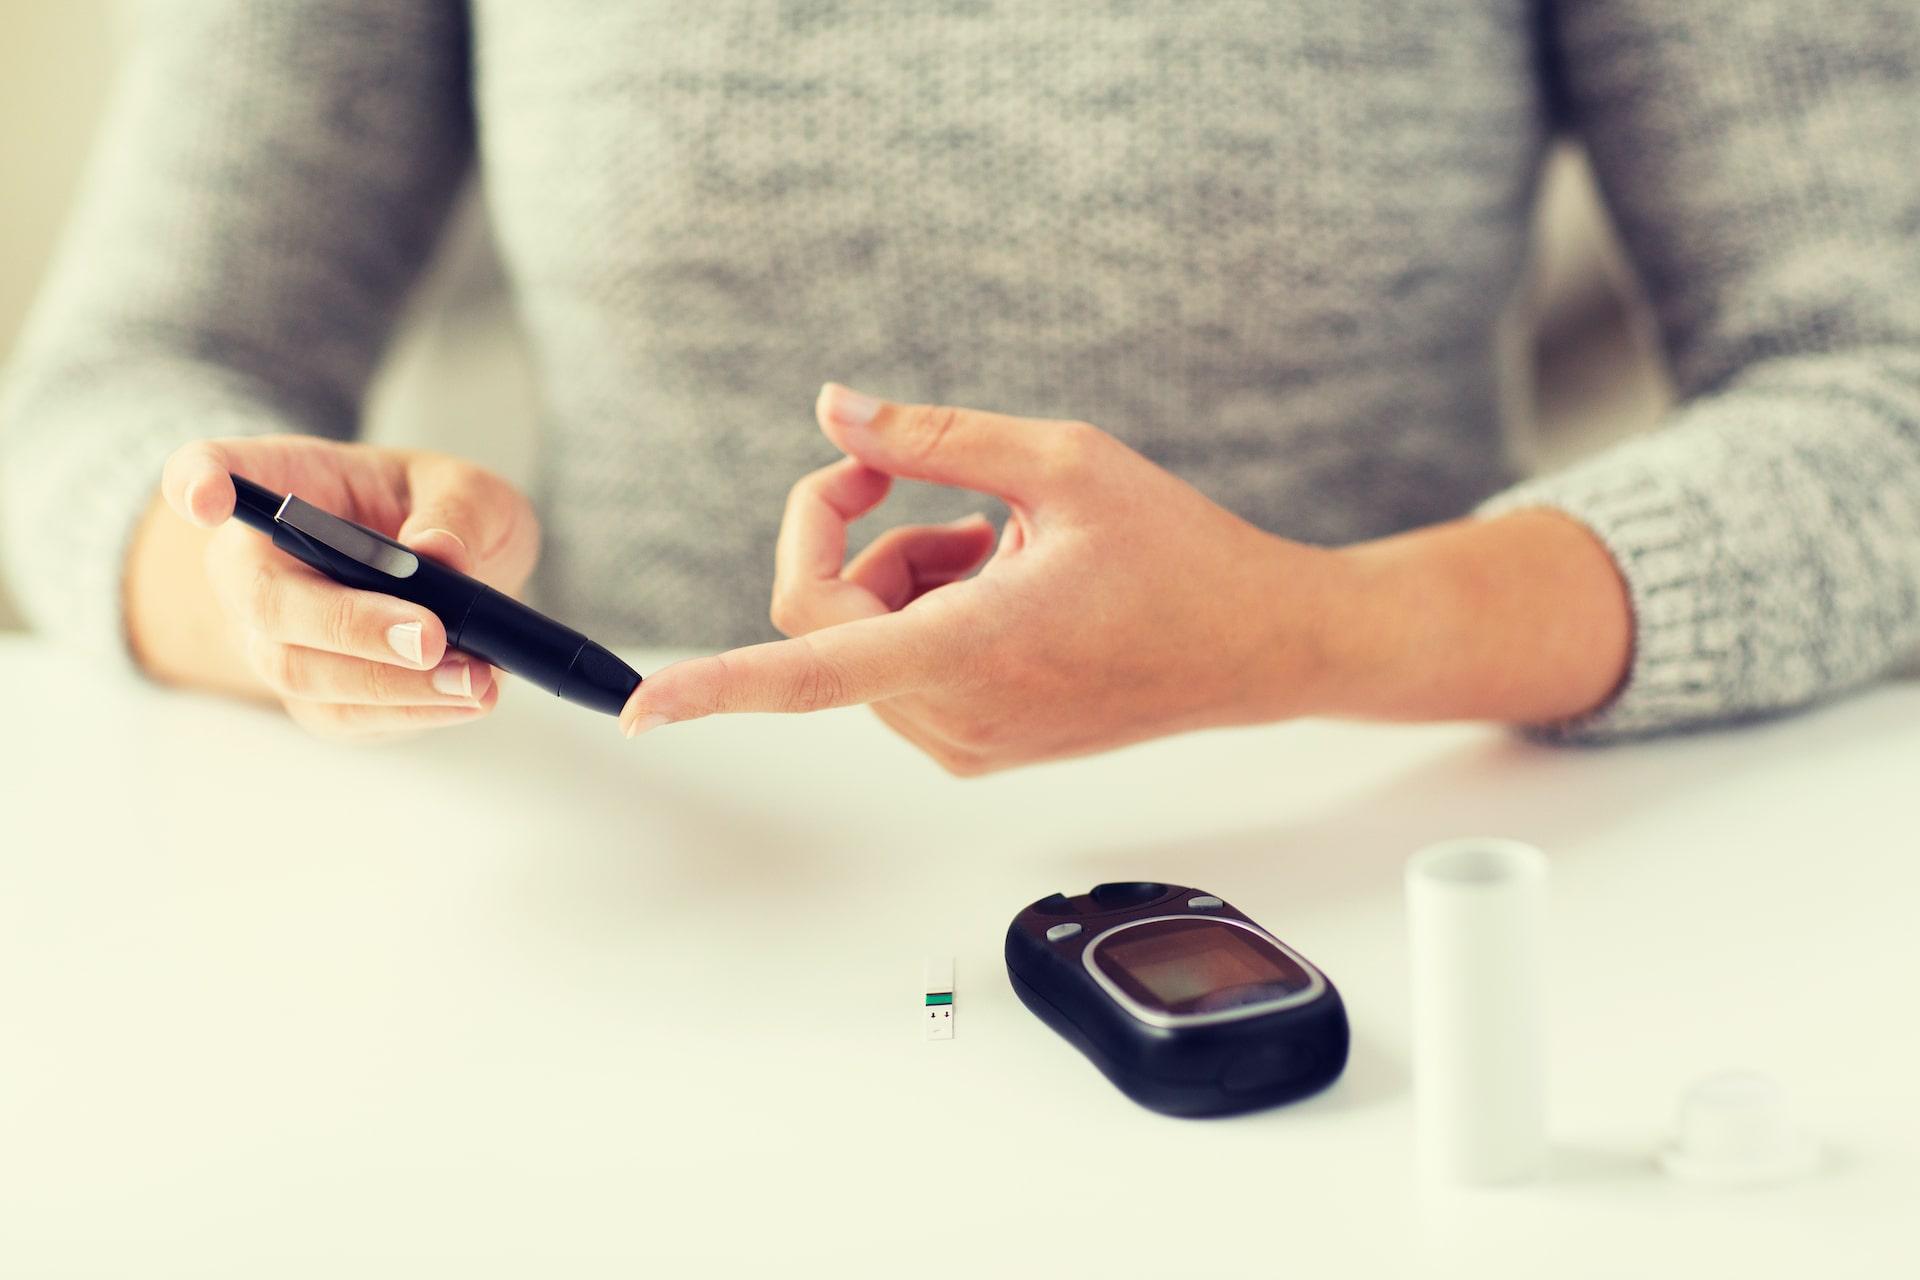 Chirofisiogen-Center-Check-up-analisi-diabete-min